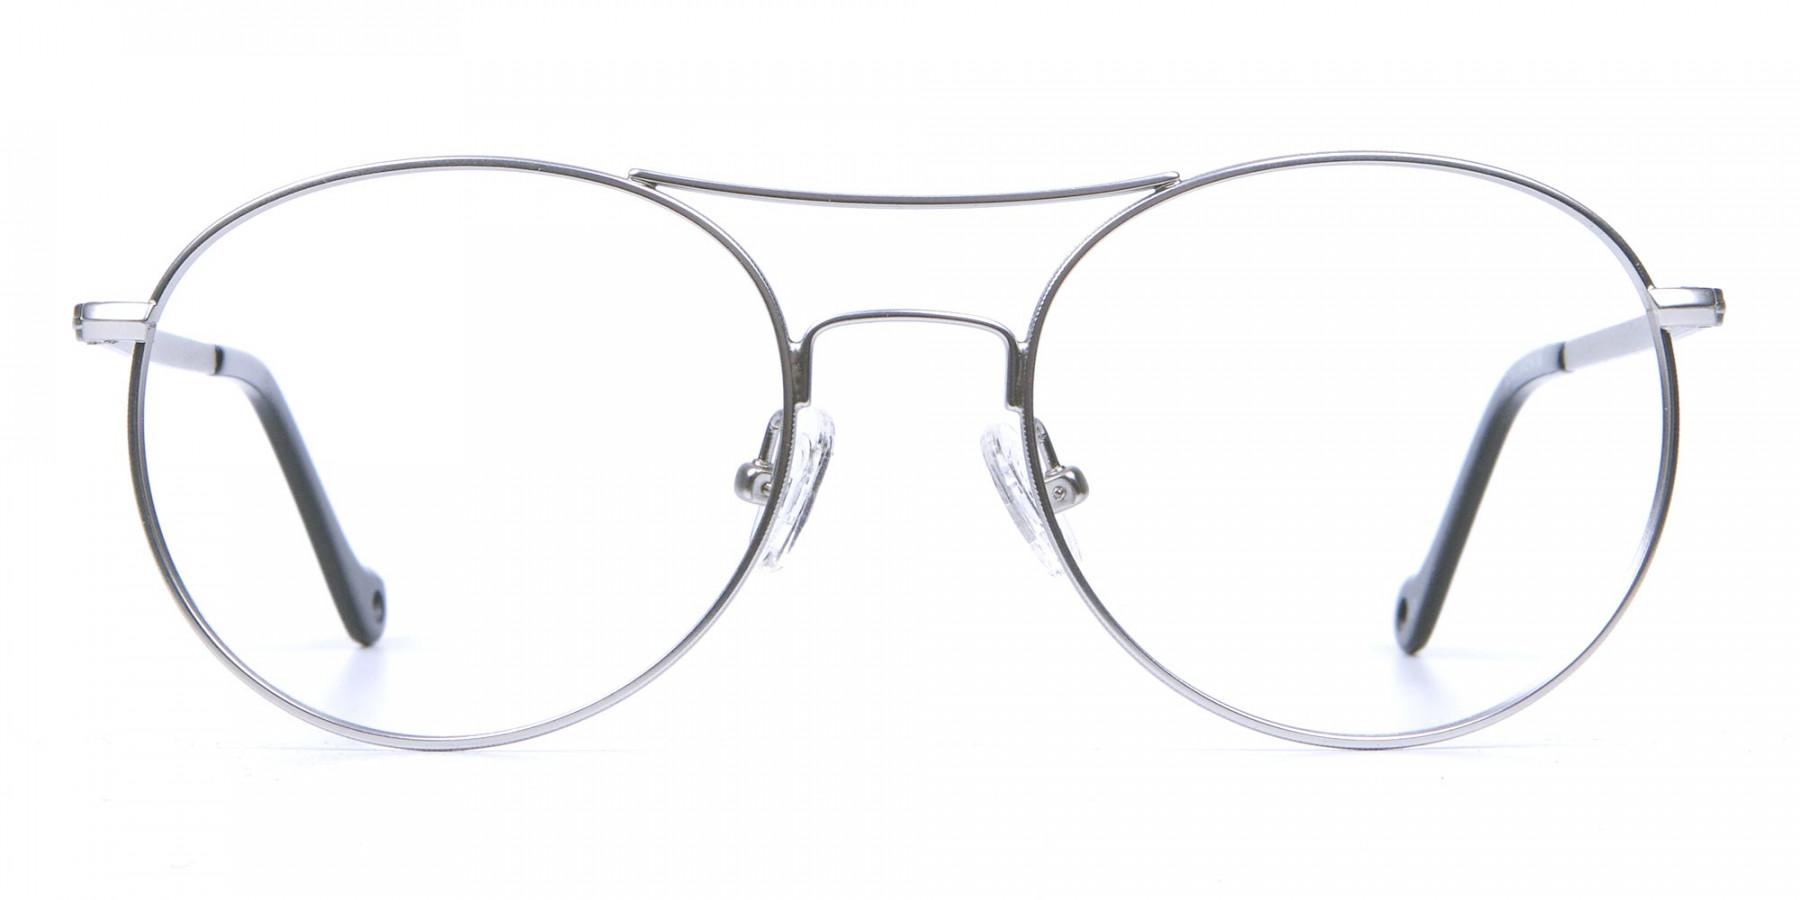 Silver Round Glasses, Eyeglasses -1